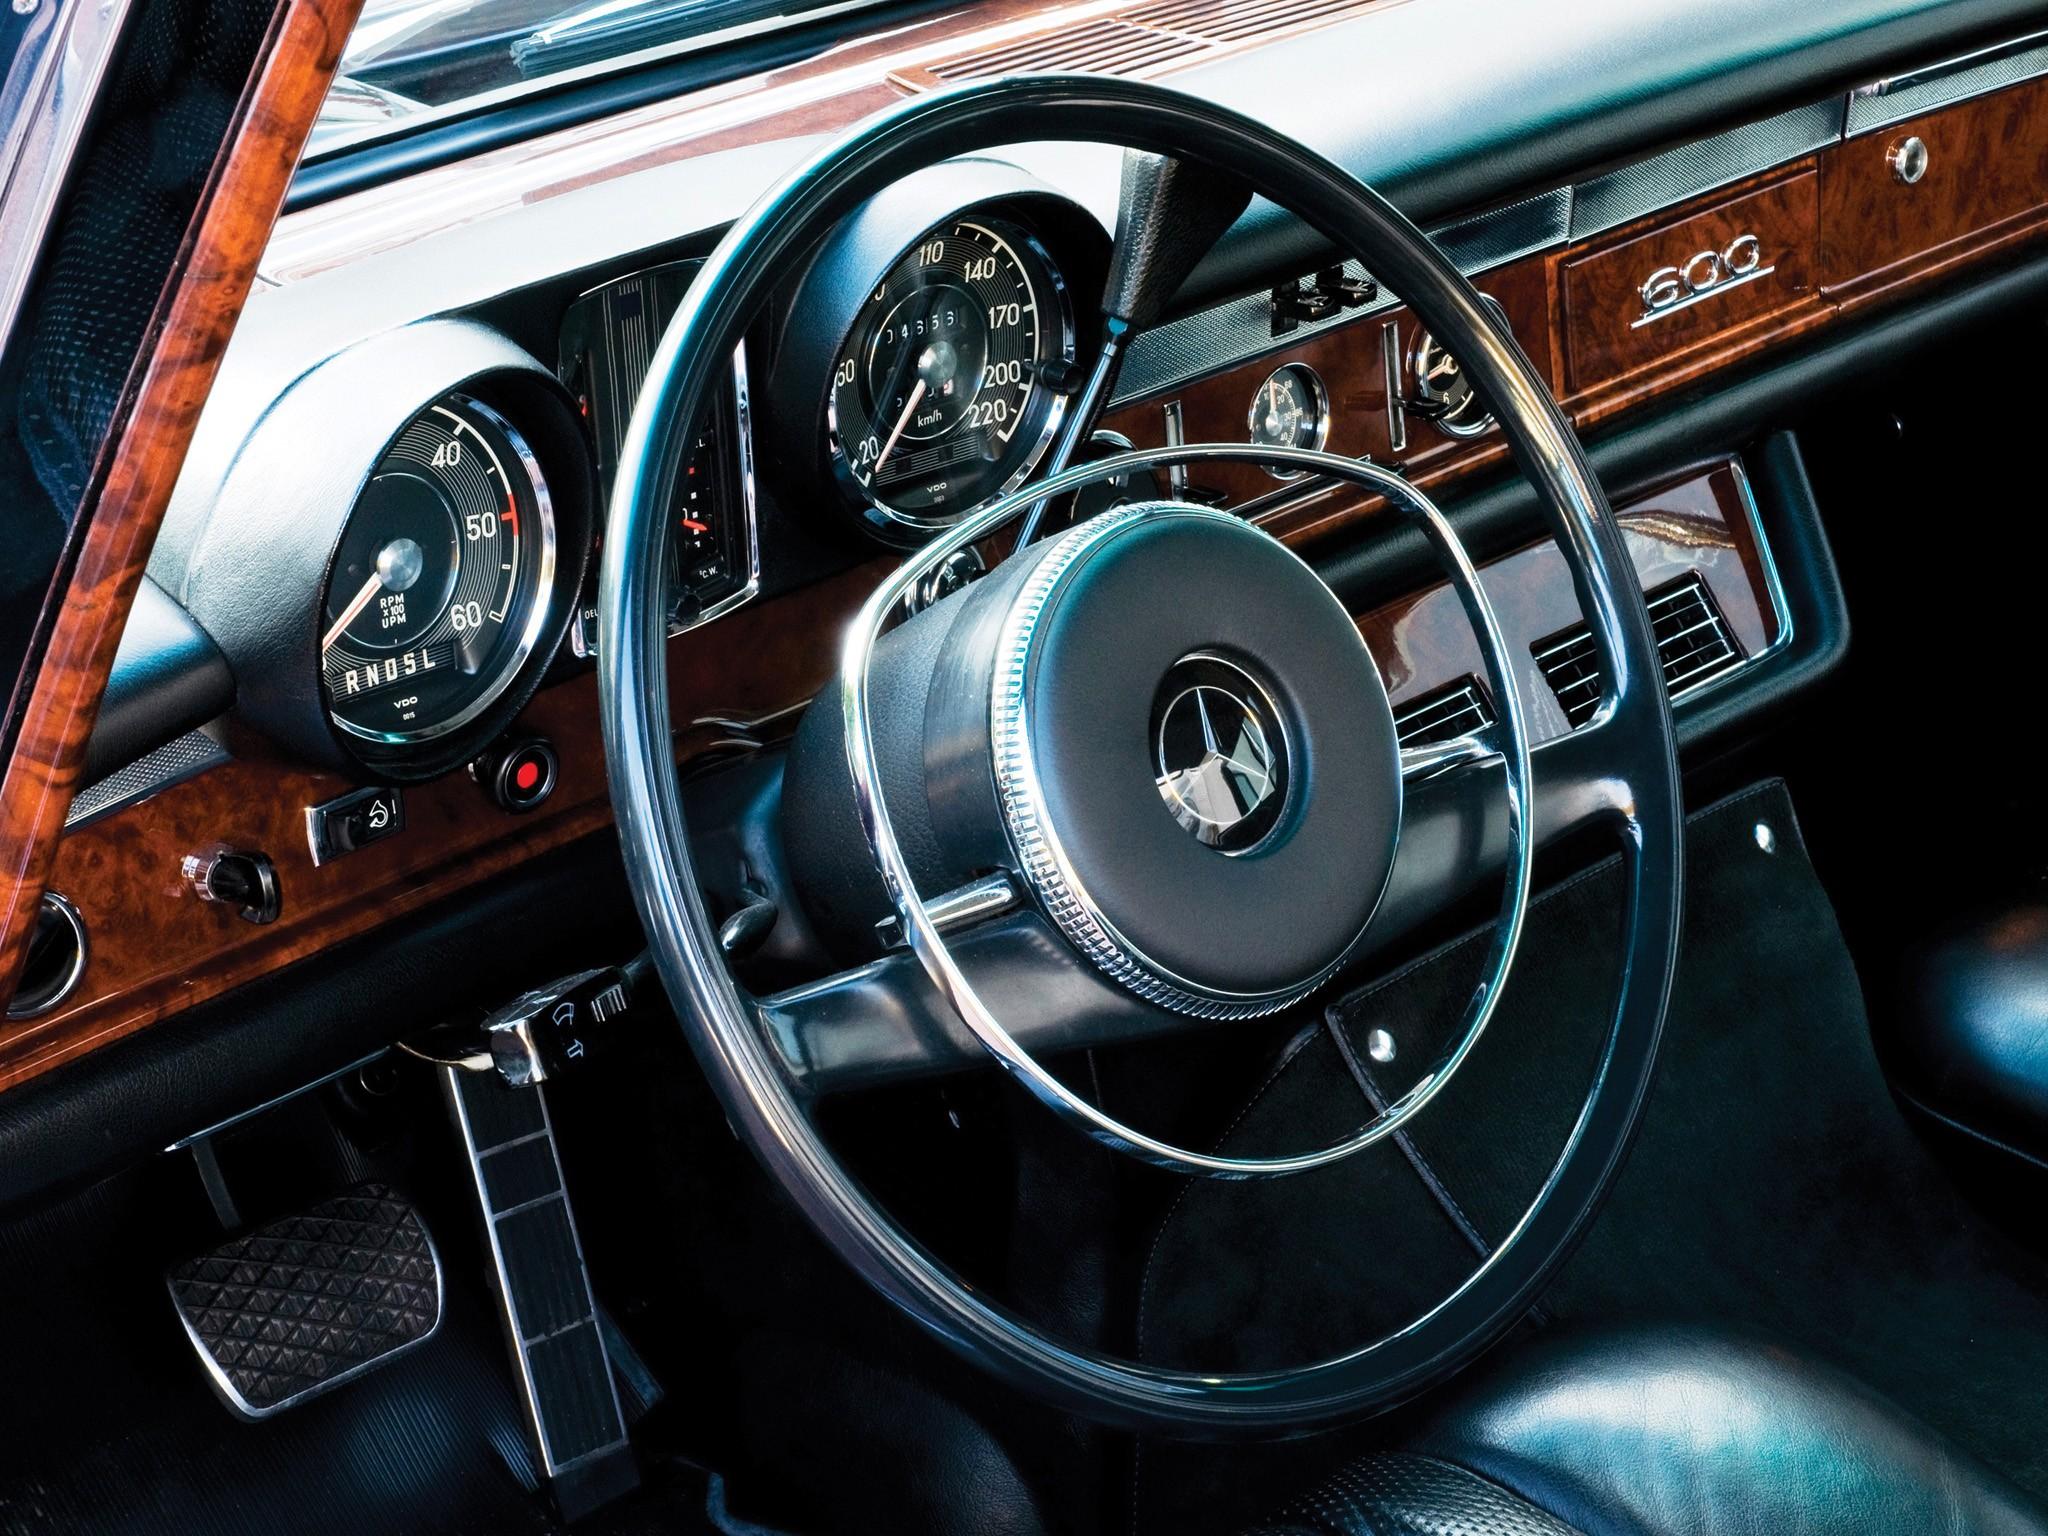 World Car Kia >> MERCEDES BENZ 600 Landaulet (W100) - 1965, 1966, 1967 ...